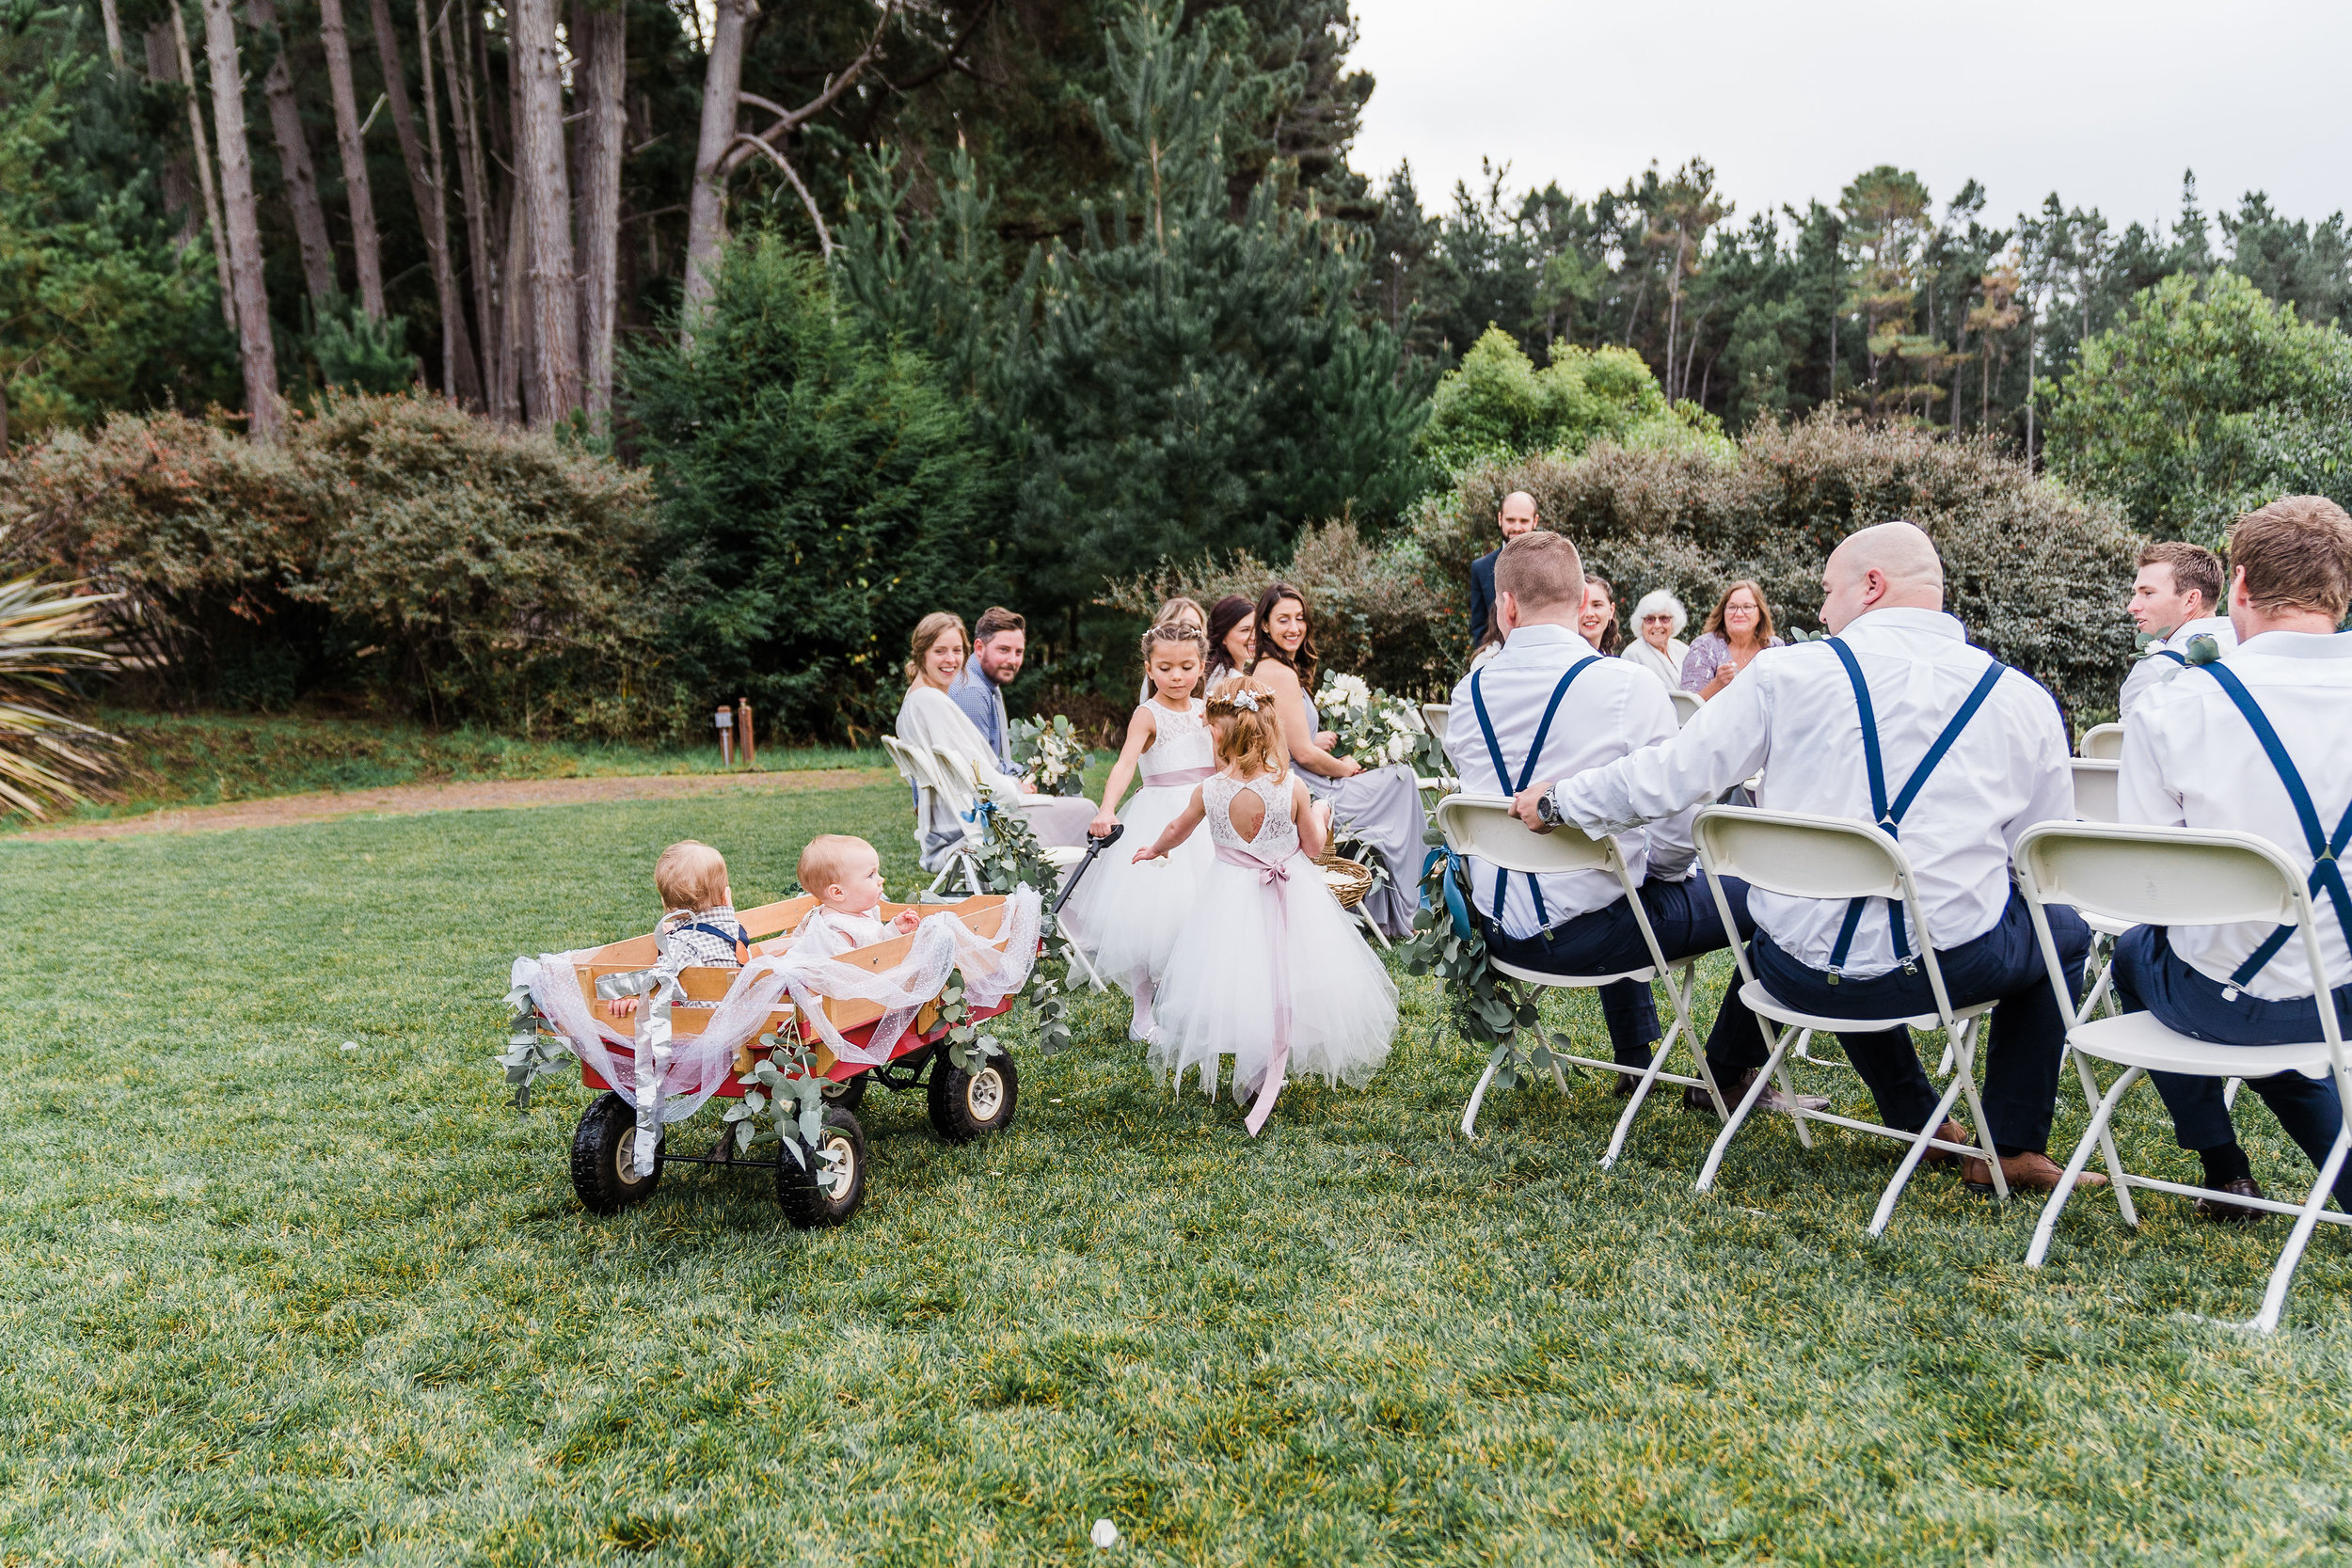 switzer-farm-wedding-westport-brandon-bibbins-photograhy-fine-art-053.jpg